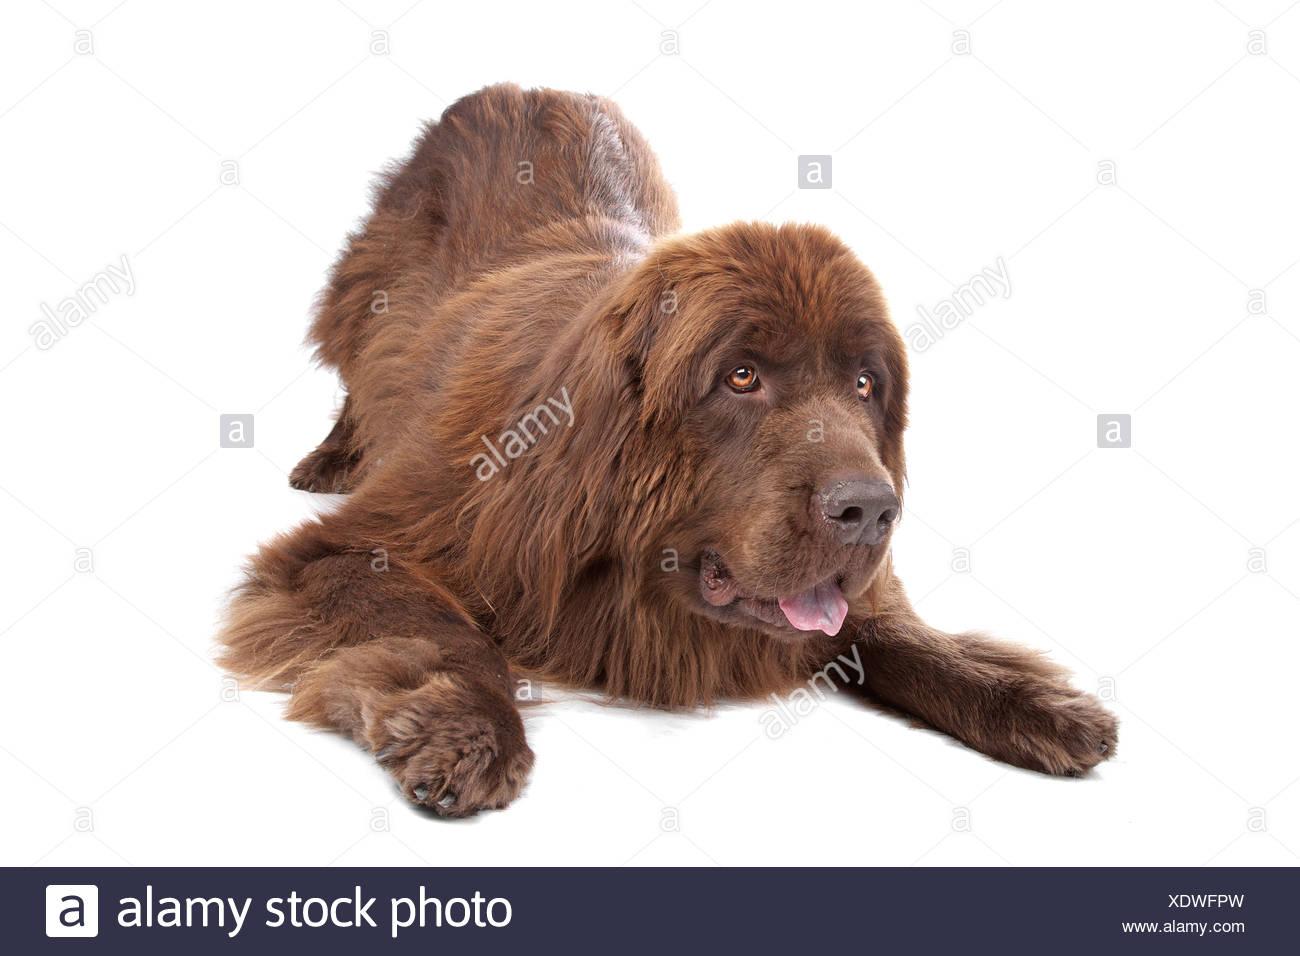 Brown Newfoundland dog isolated on white - Stock Image